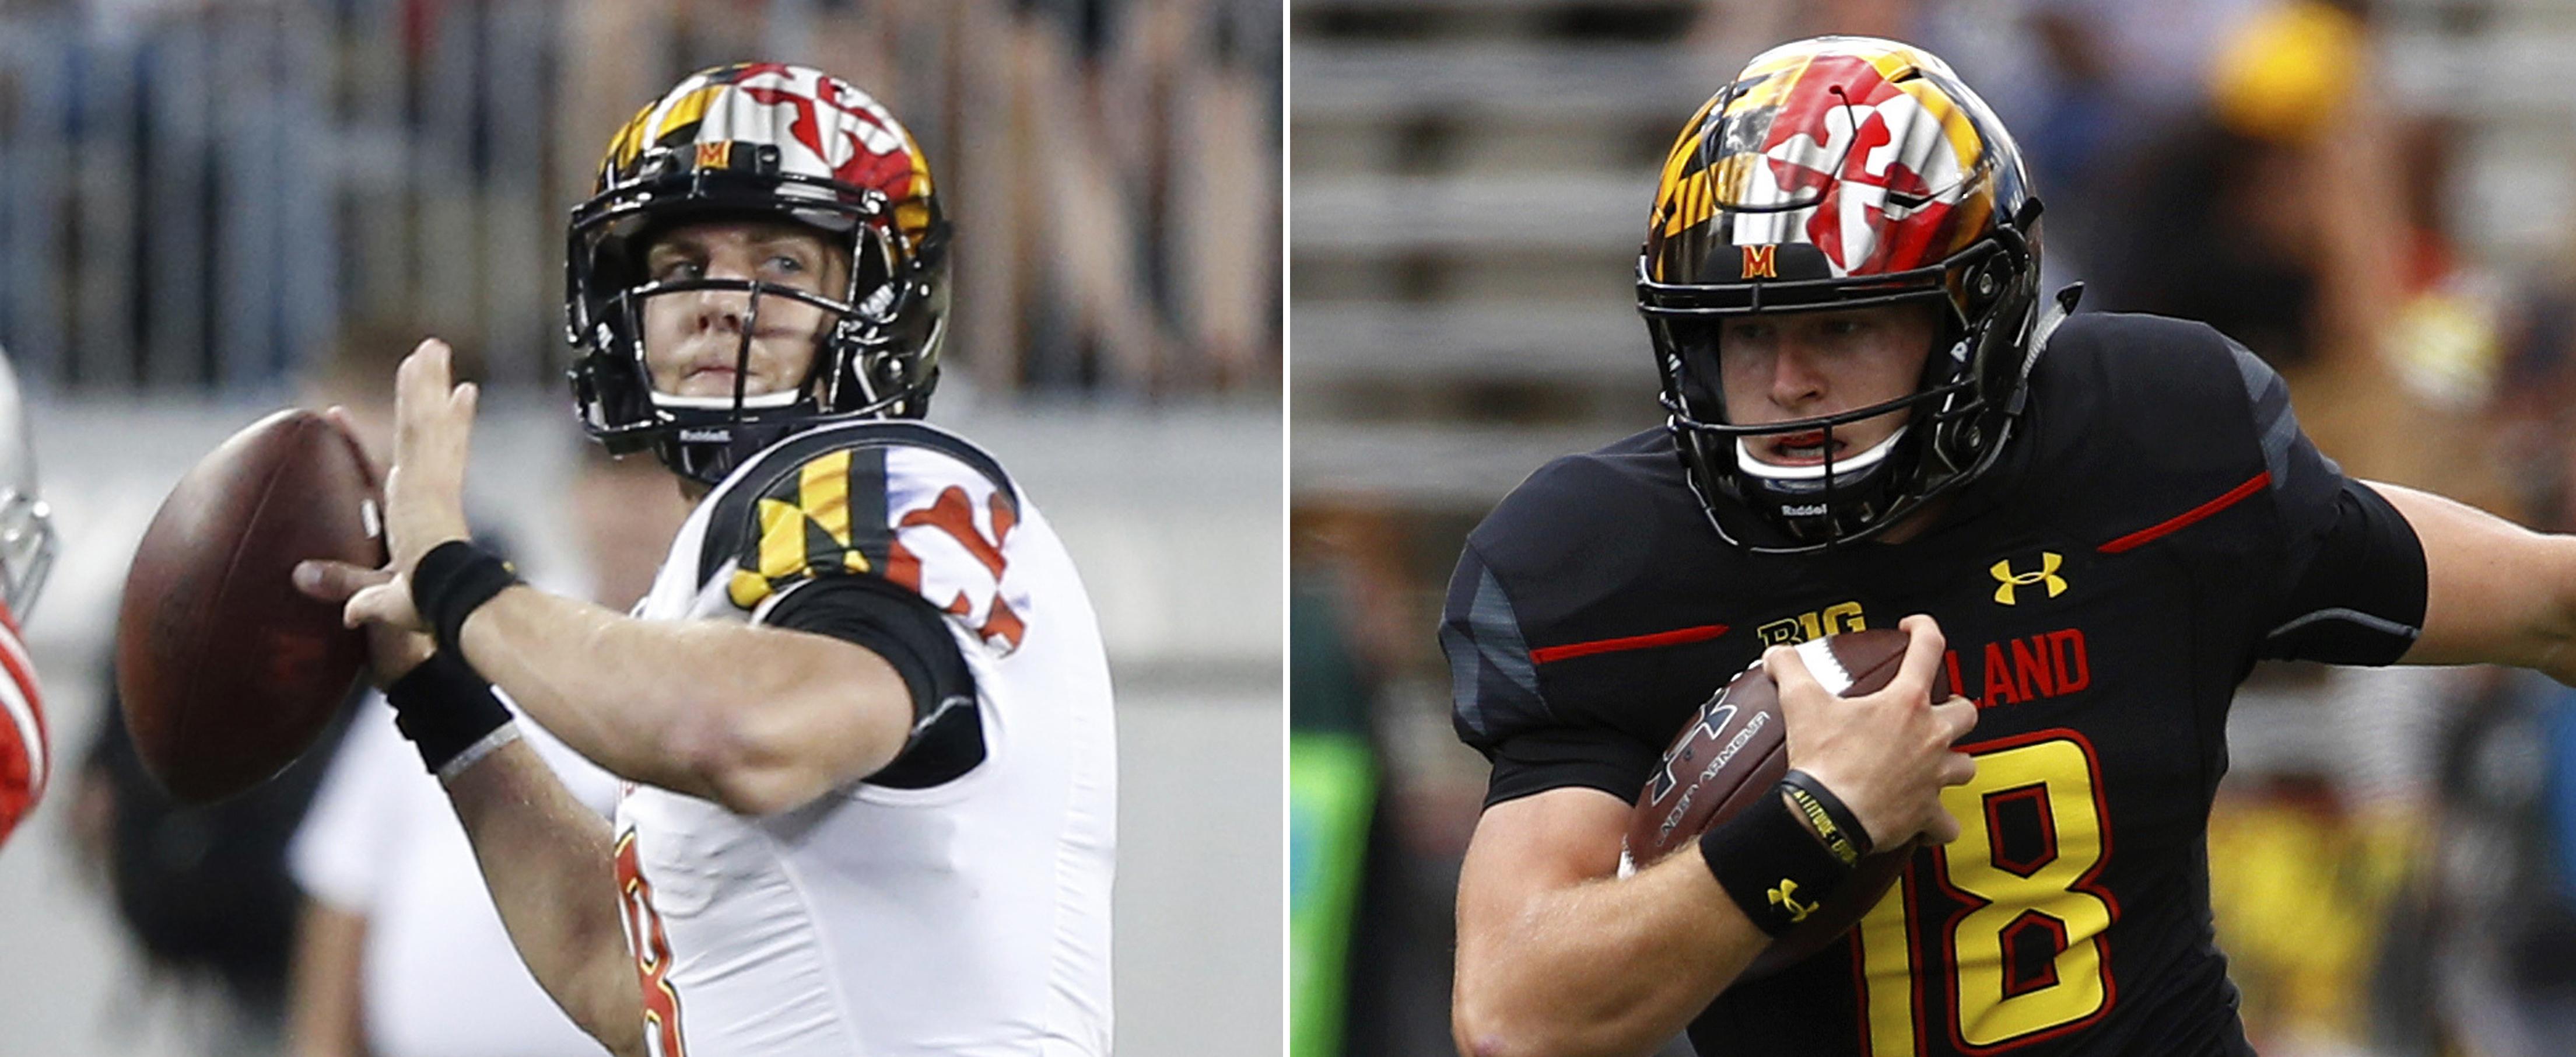 Maryland_offense_football_95178